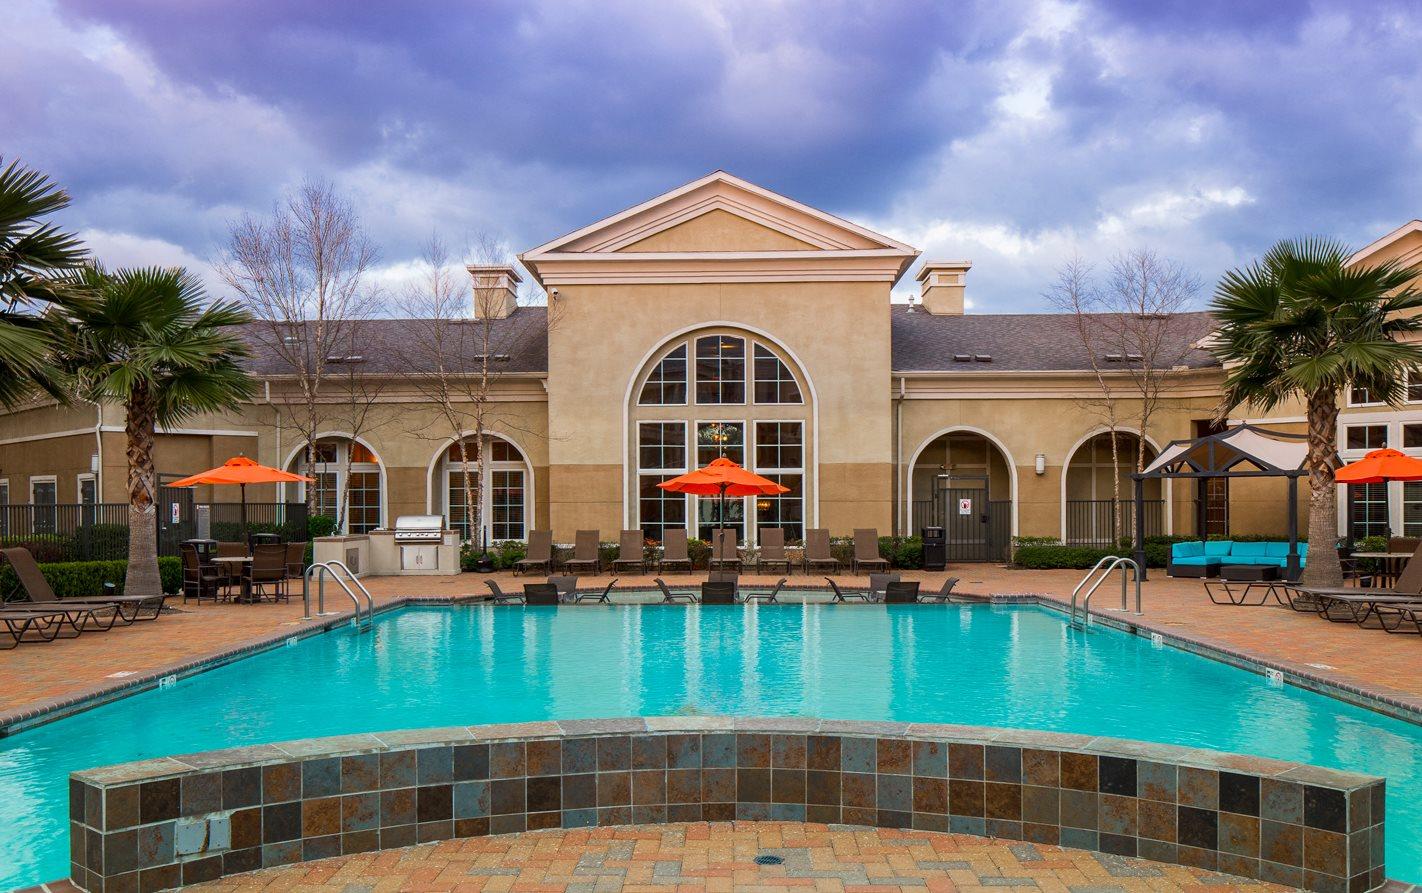 Pool  at The Millennium Towne Center